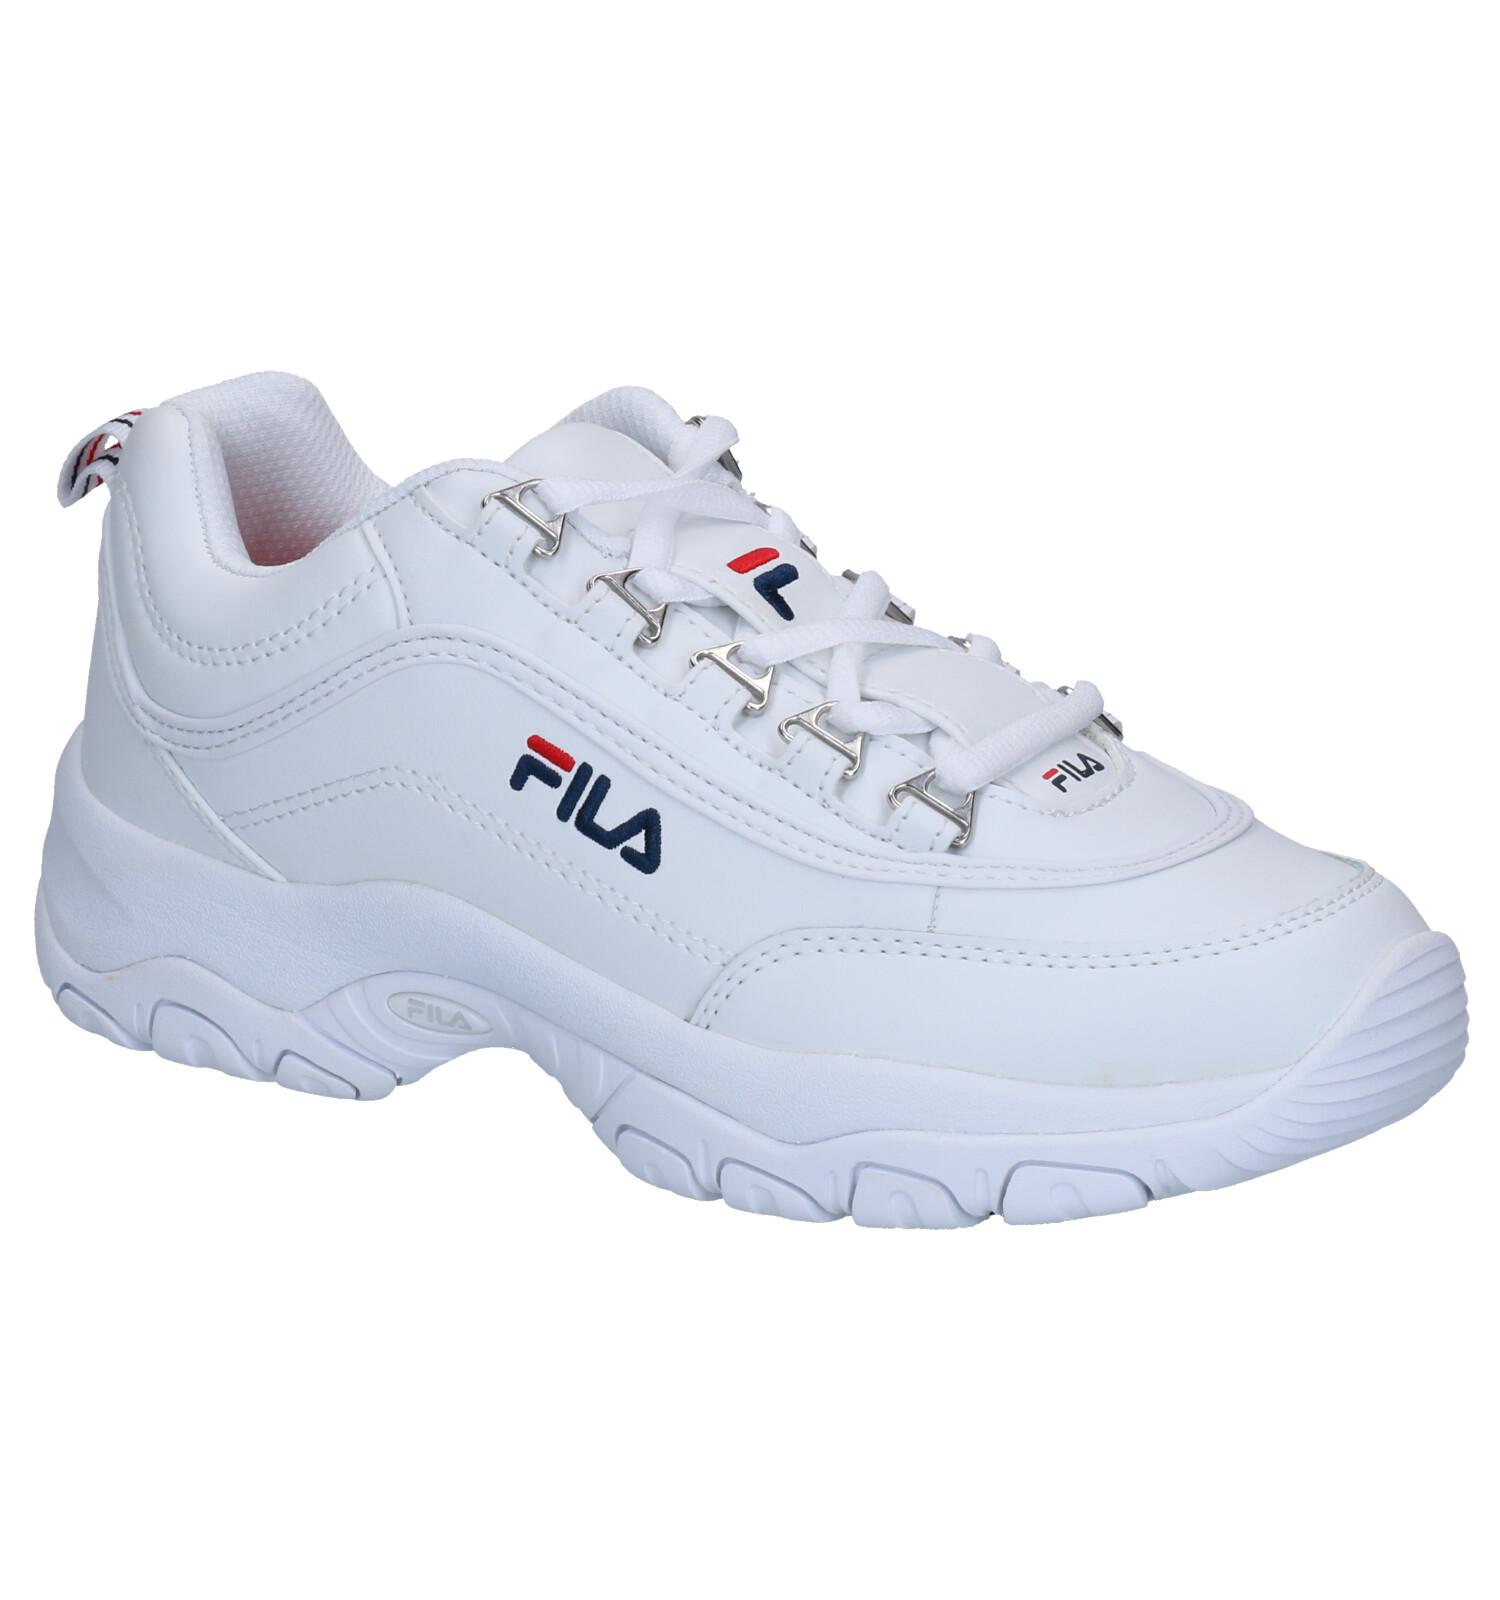 Fila Strada Low Witte Sneakers   SCHOENENTORFS.NL   Gratis verzend en retour